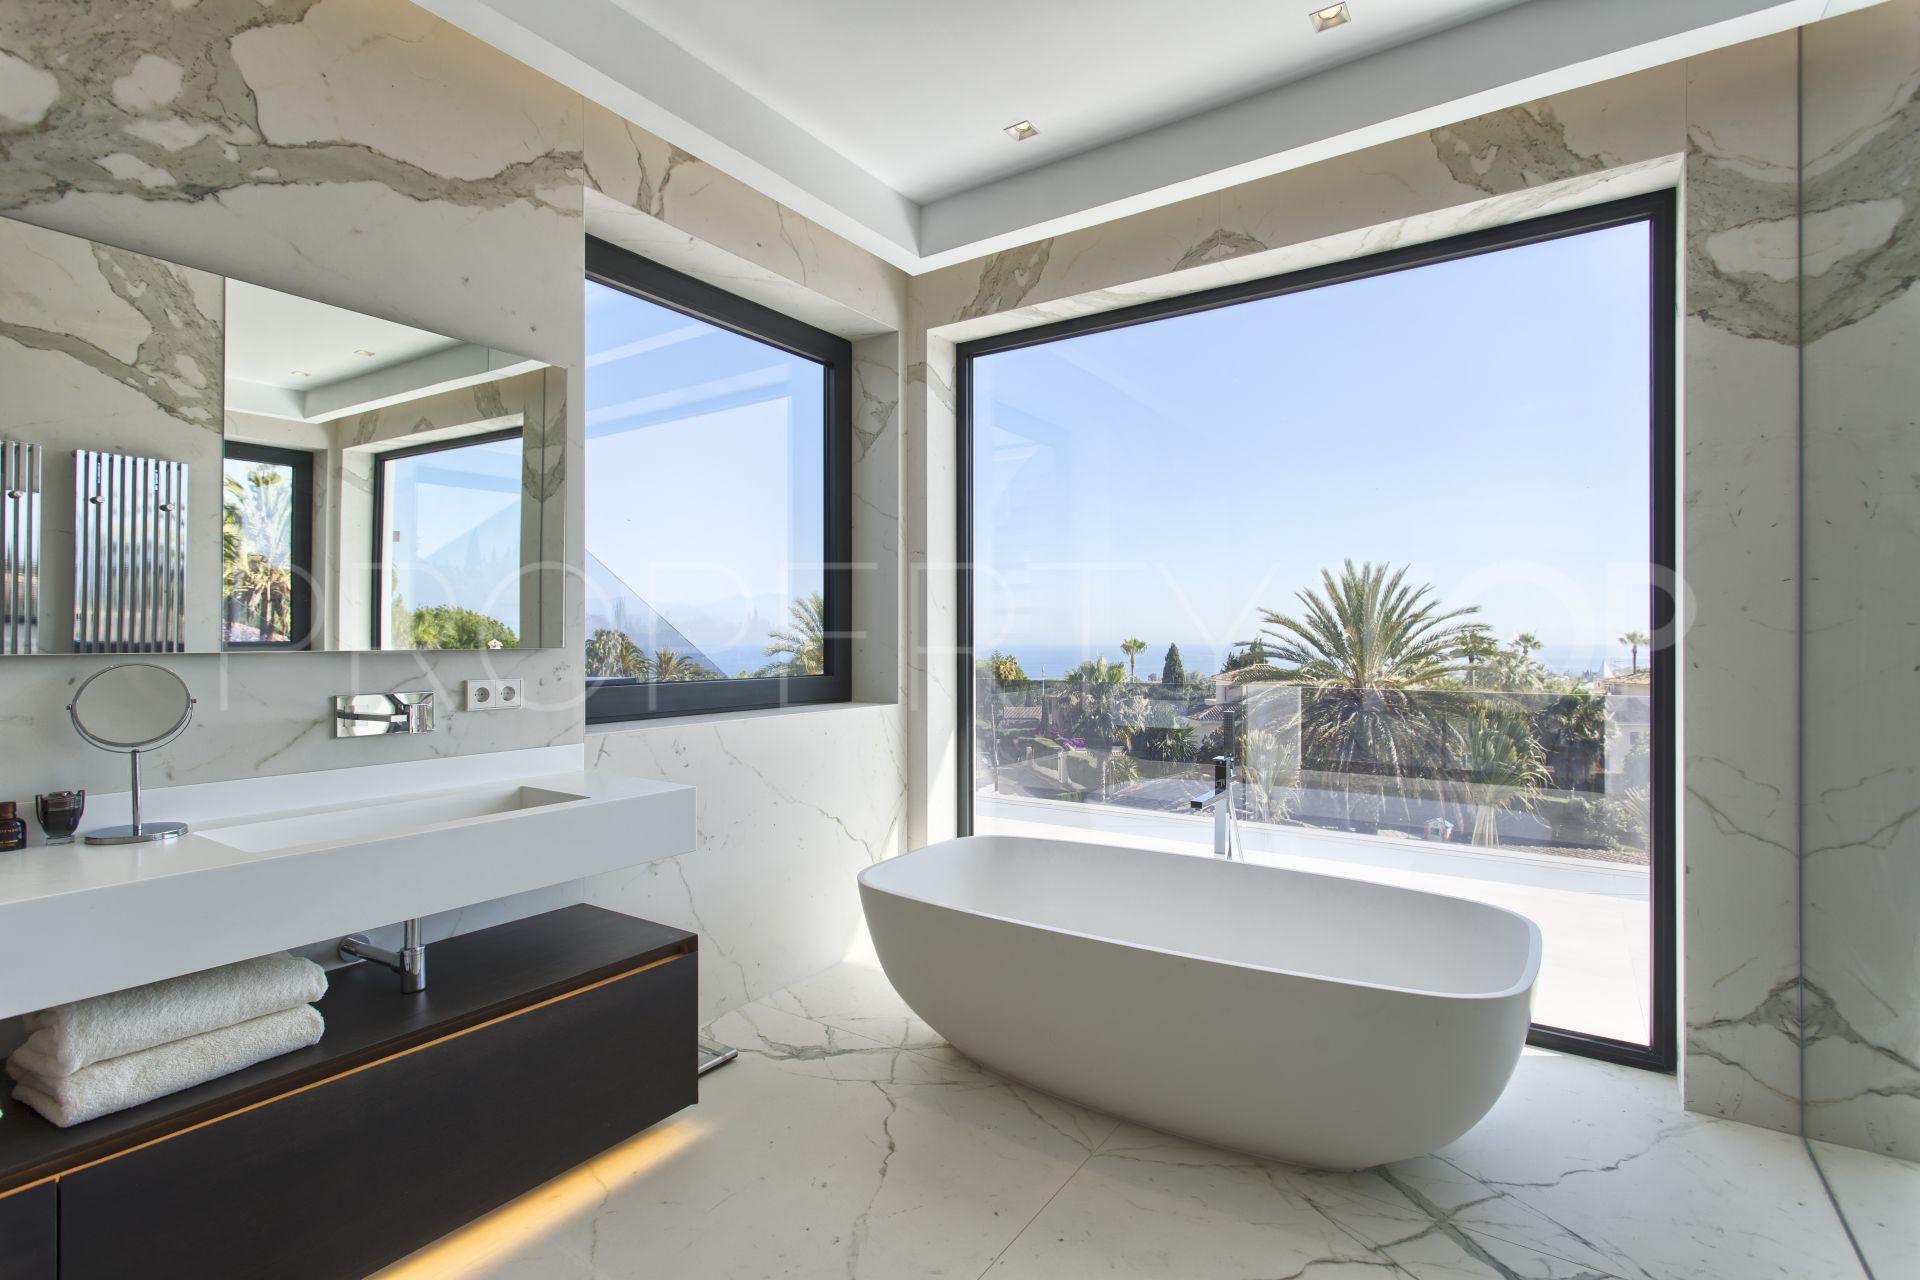 5 bedrooms Nagüeles villa for sale | Luxury Villa Sales